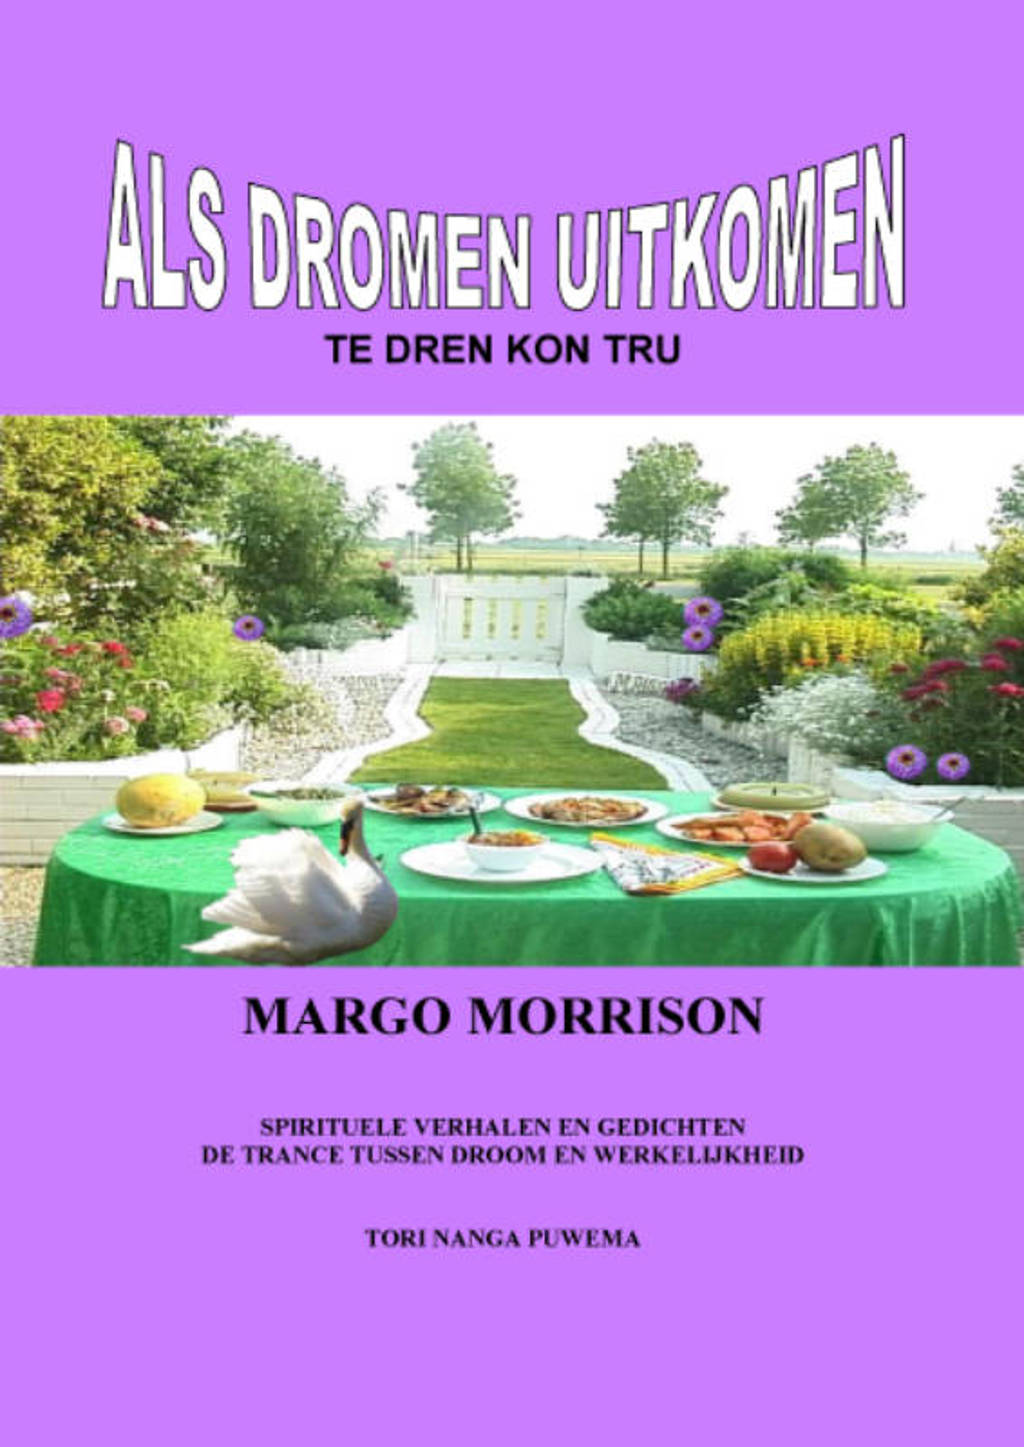 Als dromen uitkomen - Margo Morrison